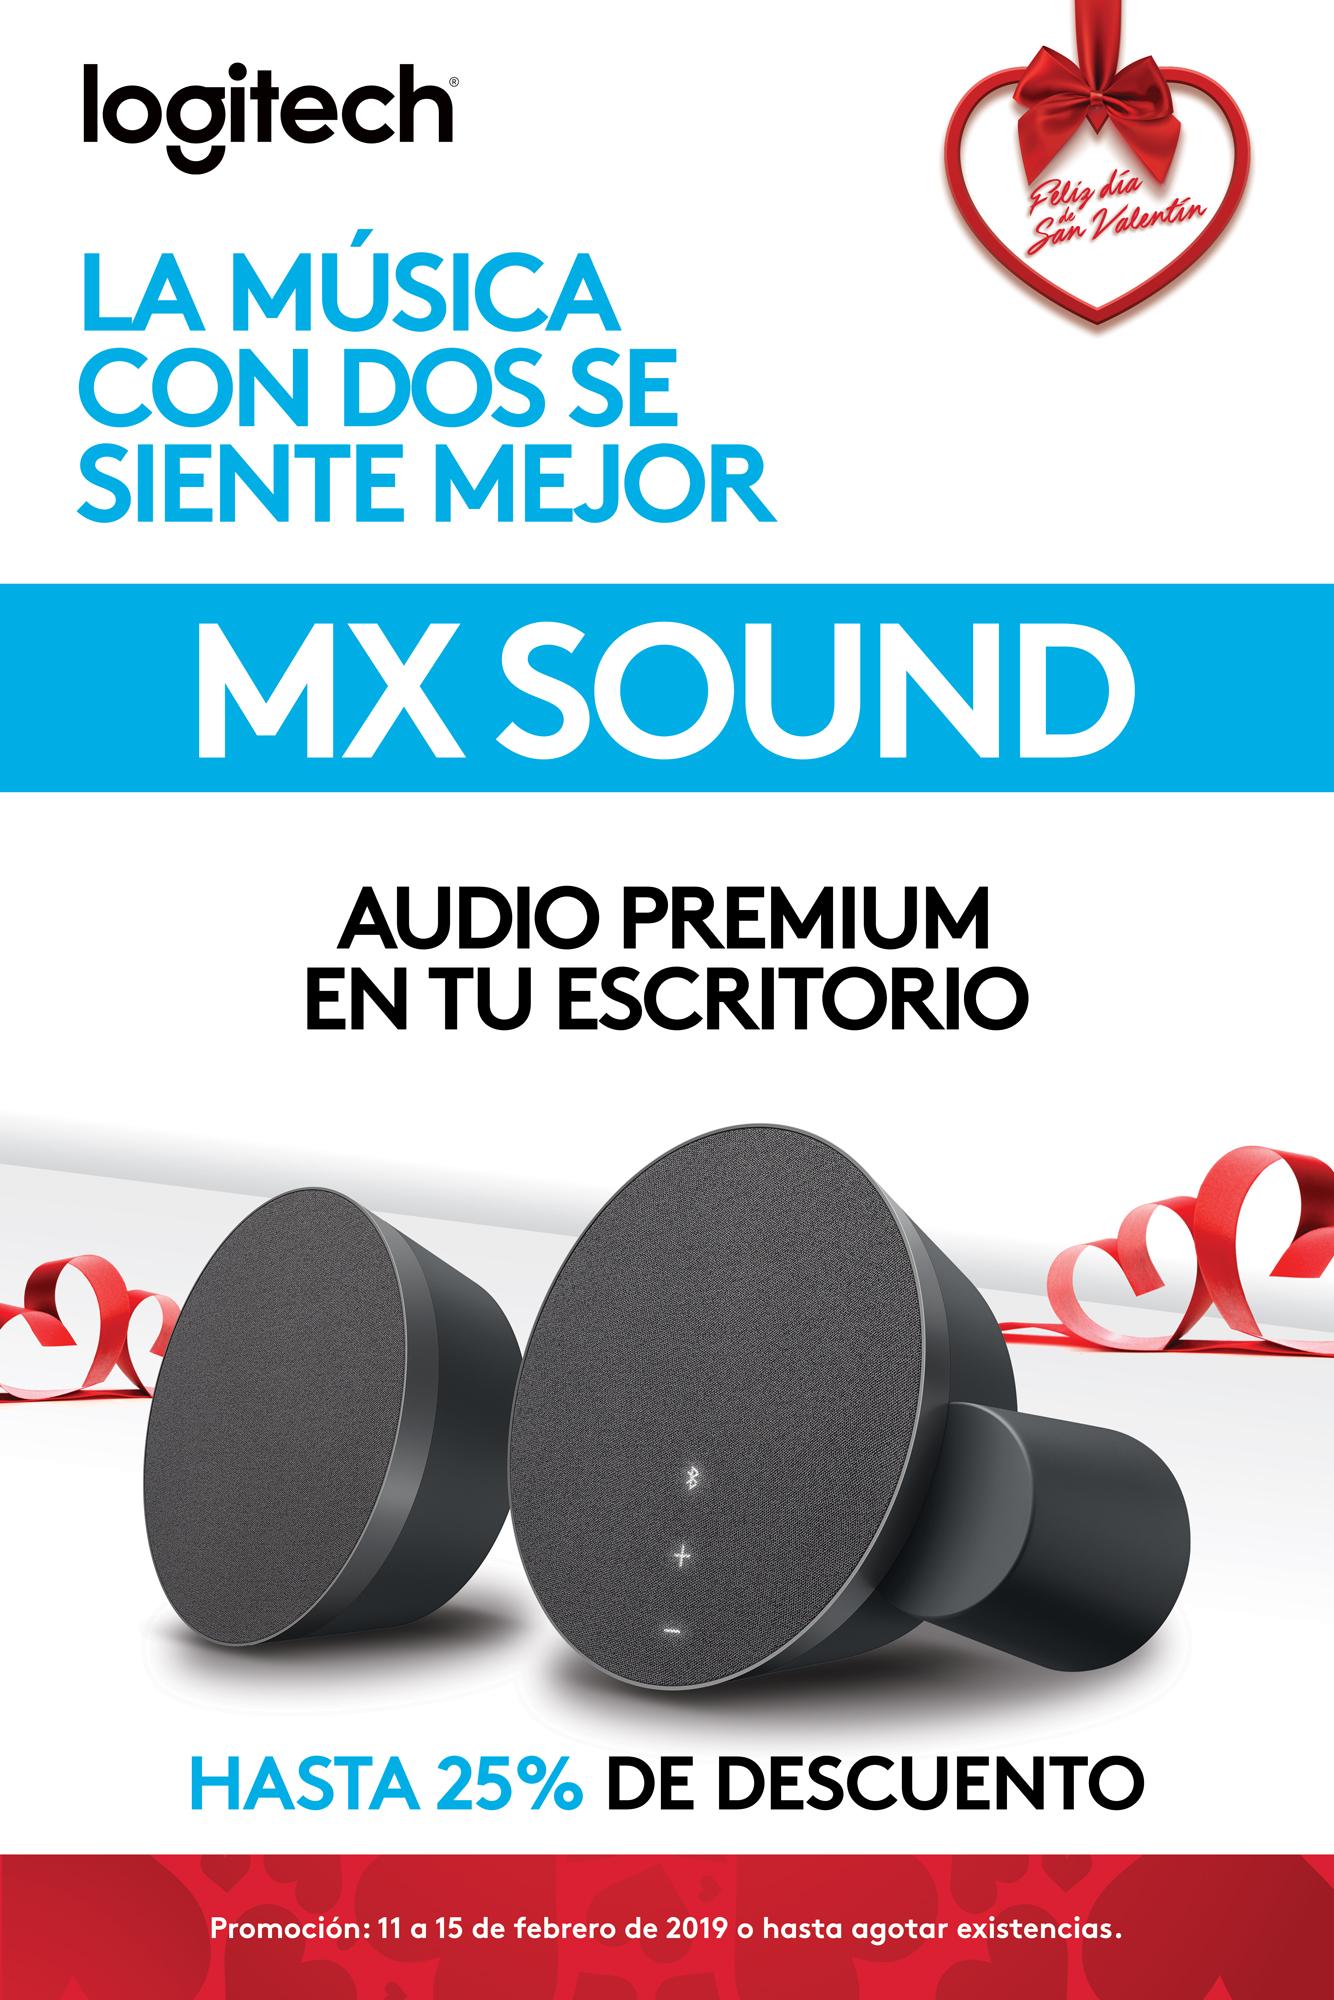 Promo MX Sound - Bocinas - Logitech